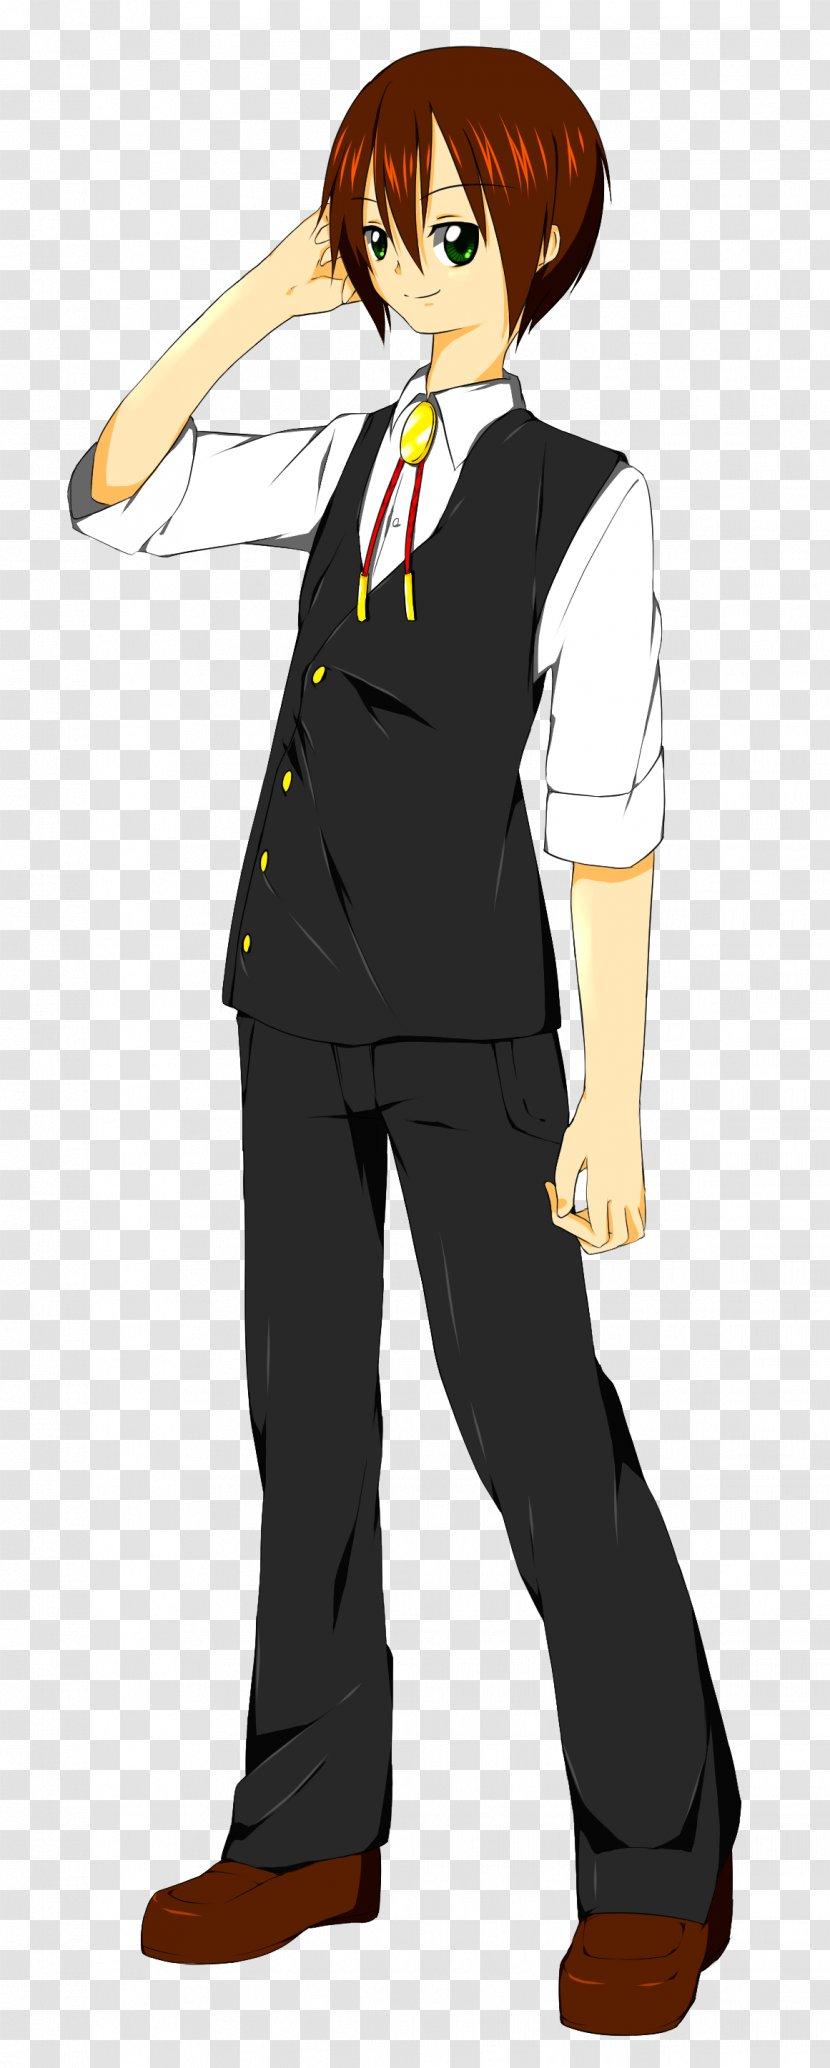 The Idolmaster 2 Tokyo Game Show Makuhari Messe Voice Actor Fashion - Cartoon - Snap Transparent PNG